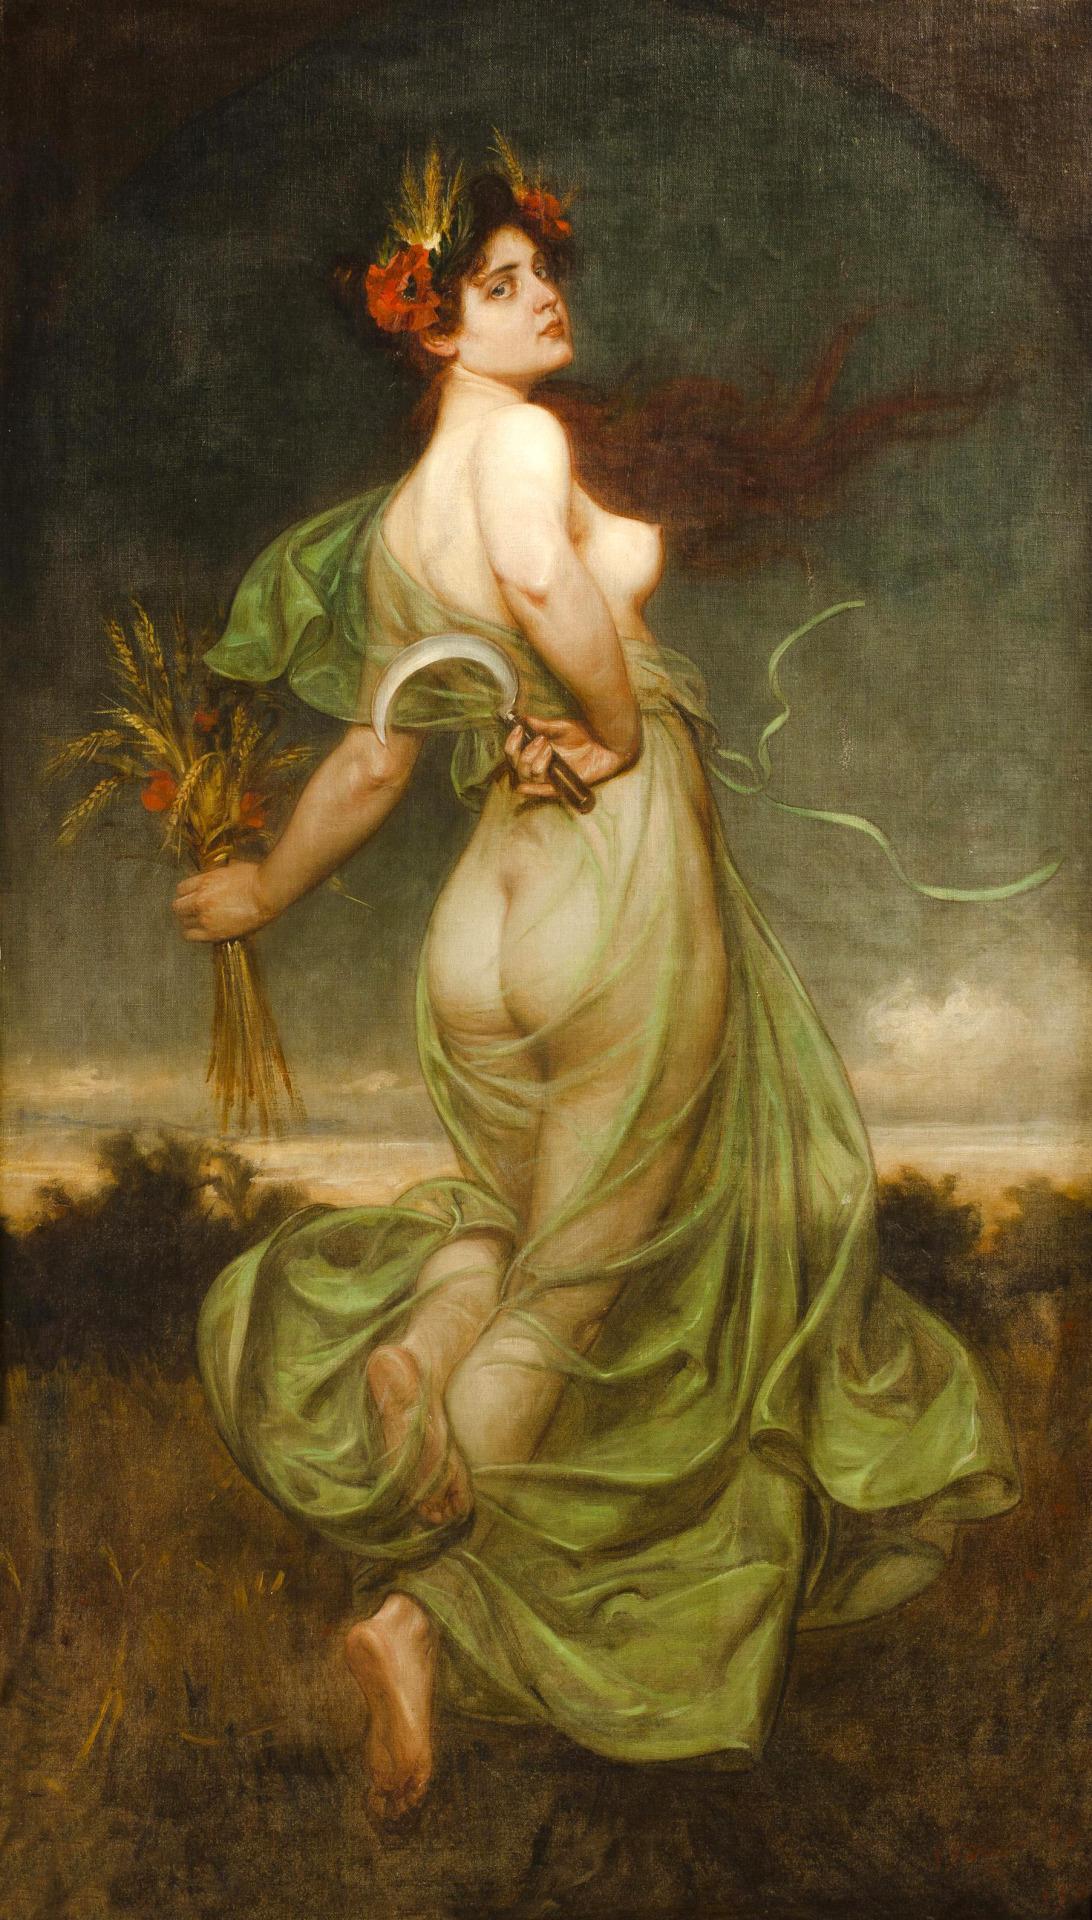 Franz Bohumil Doubek (1865-1952) - Allegory of Summer